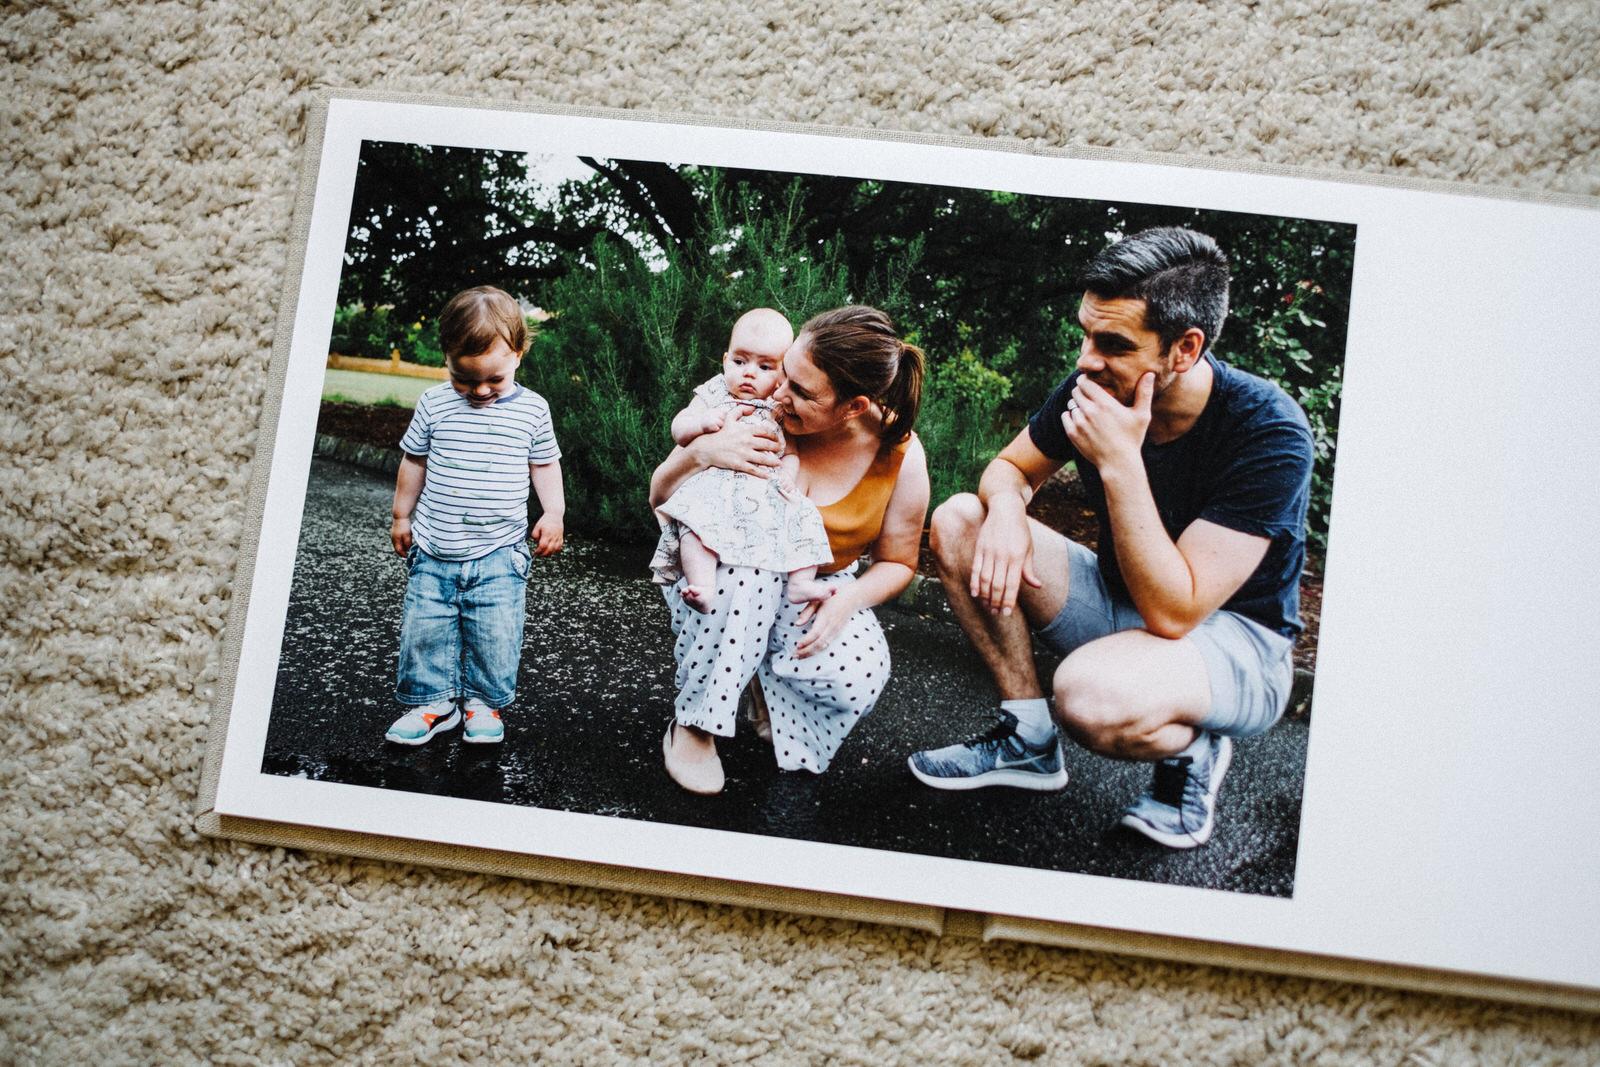 family-story-photos-photo-album-05.jpg